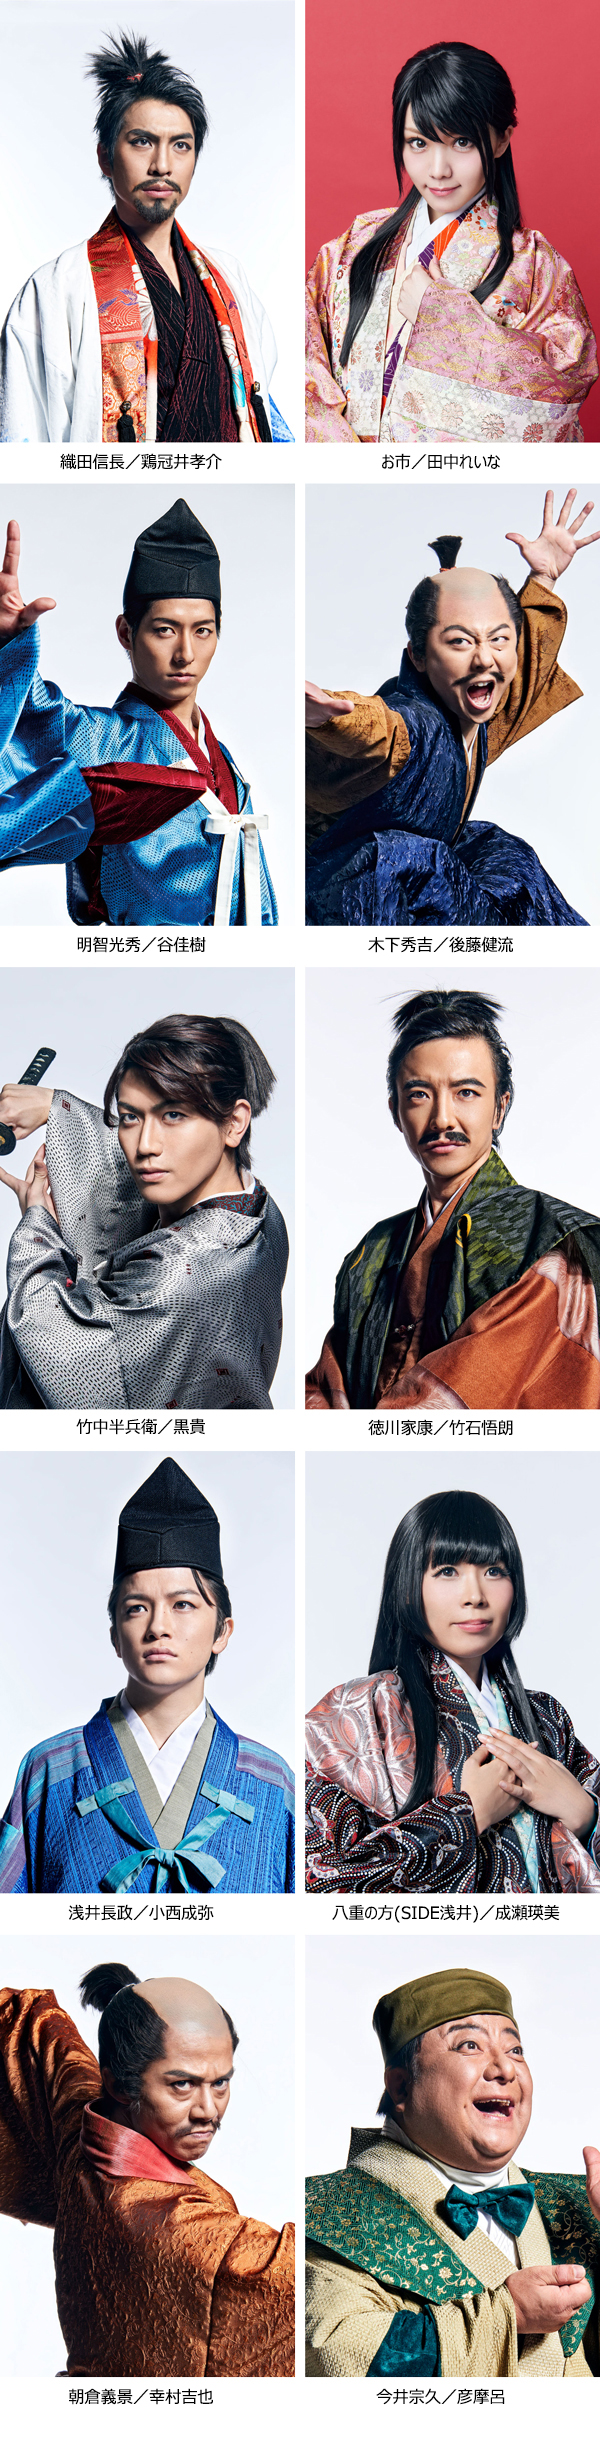 butai_nobunaganoyabou_haru_cast.jpg